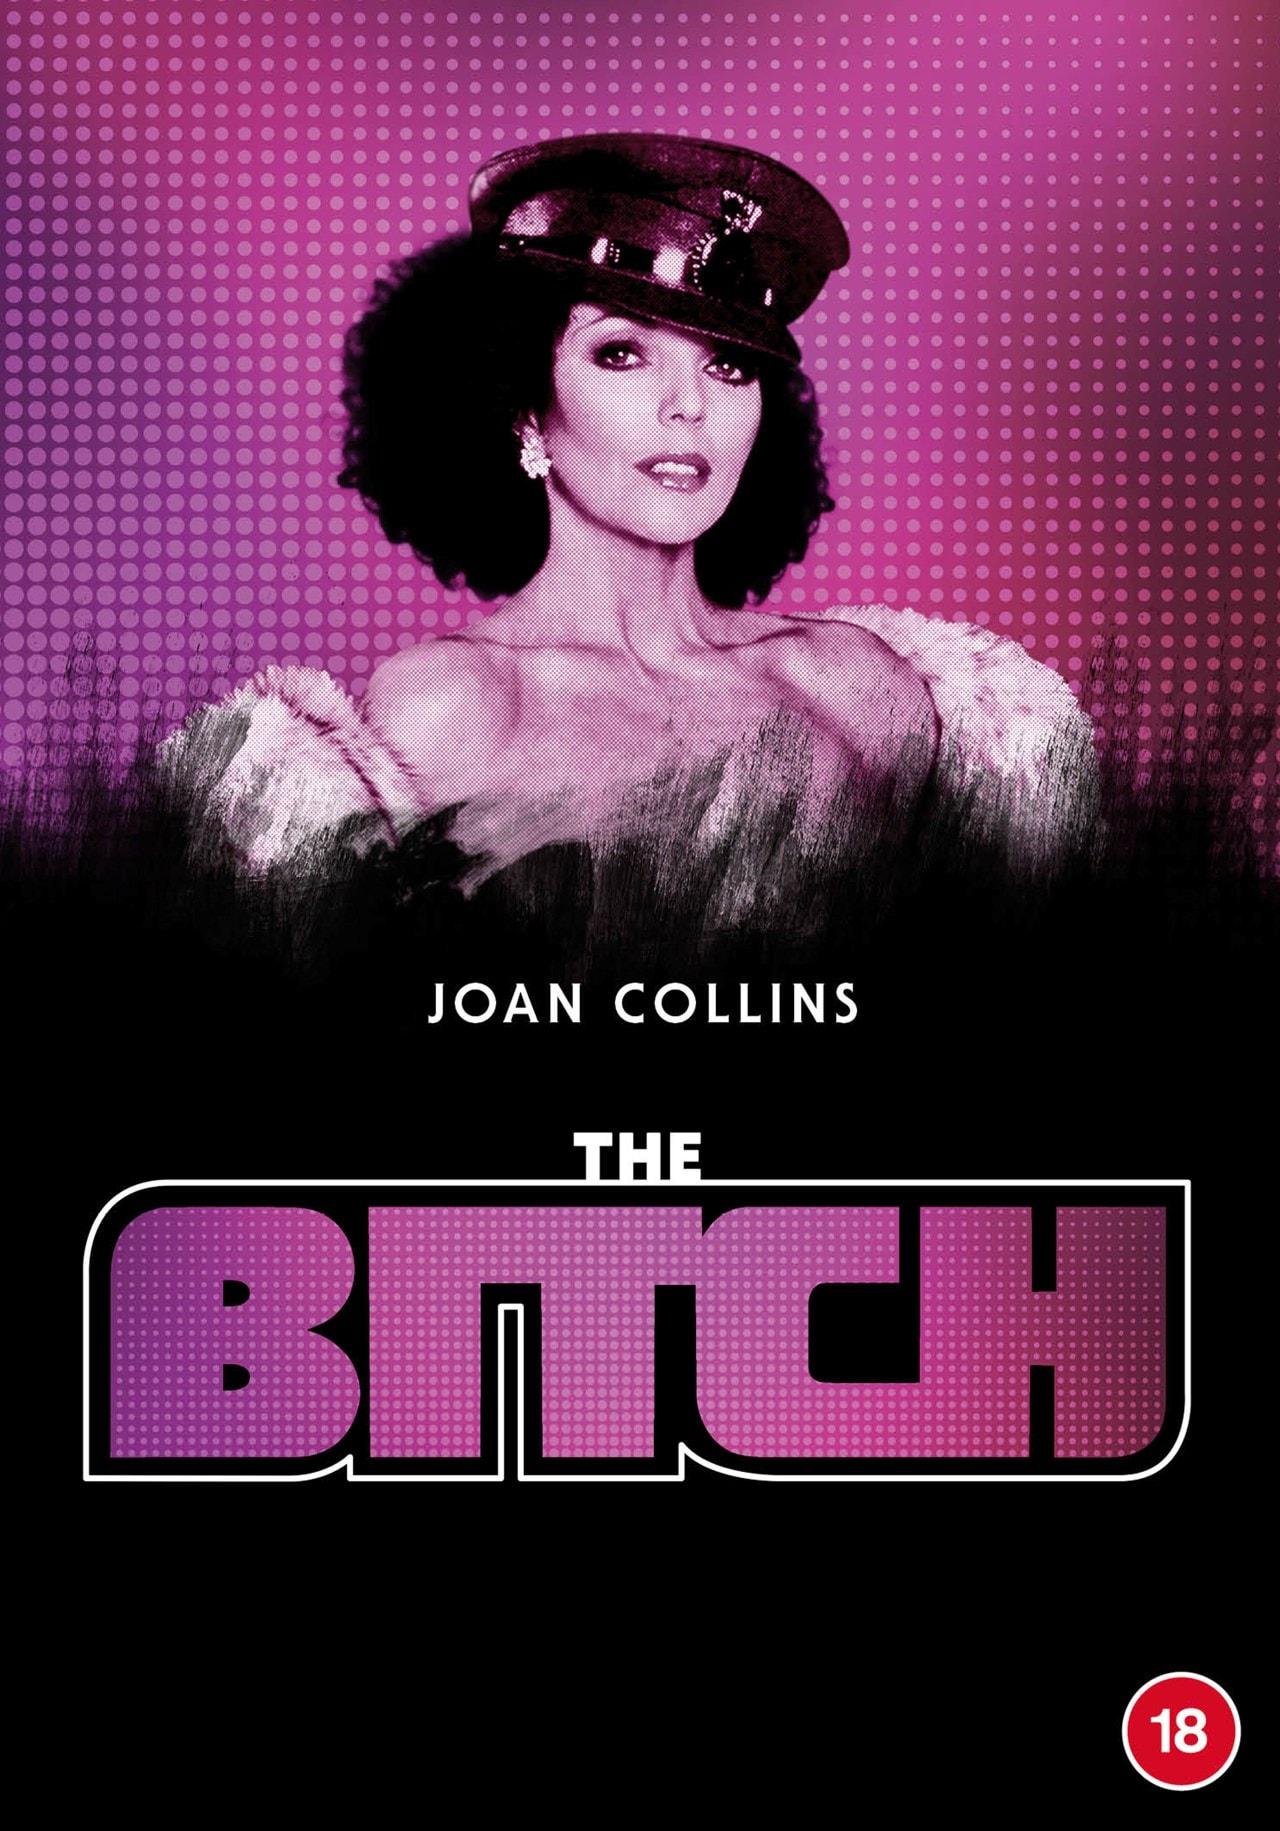 The Bitch - 1